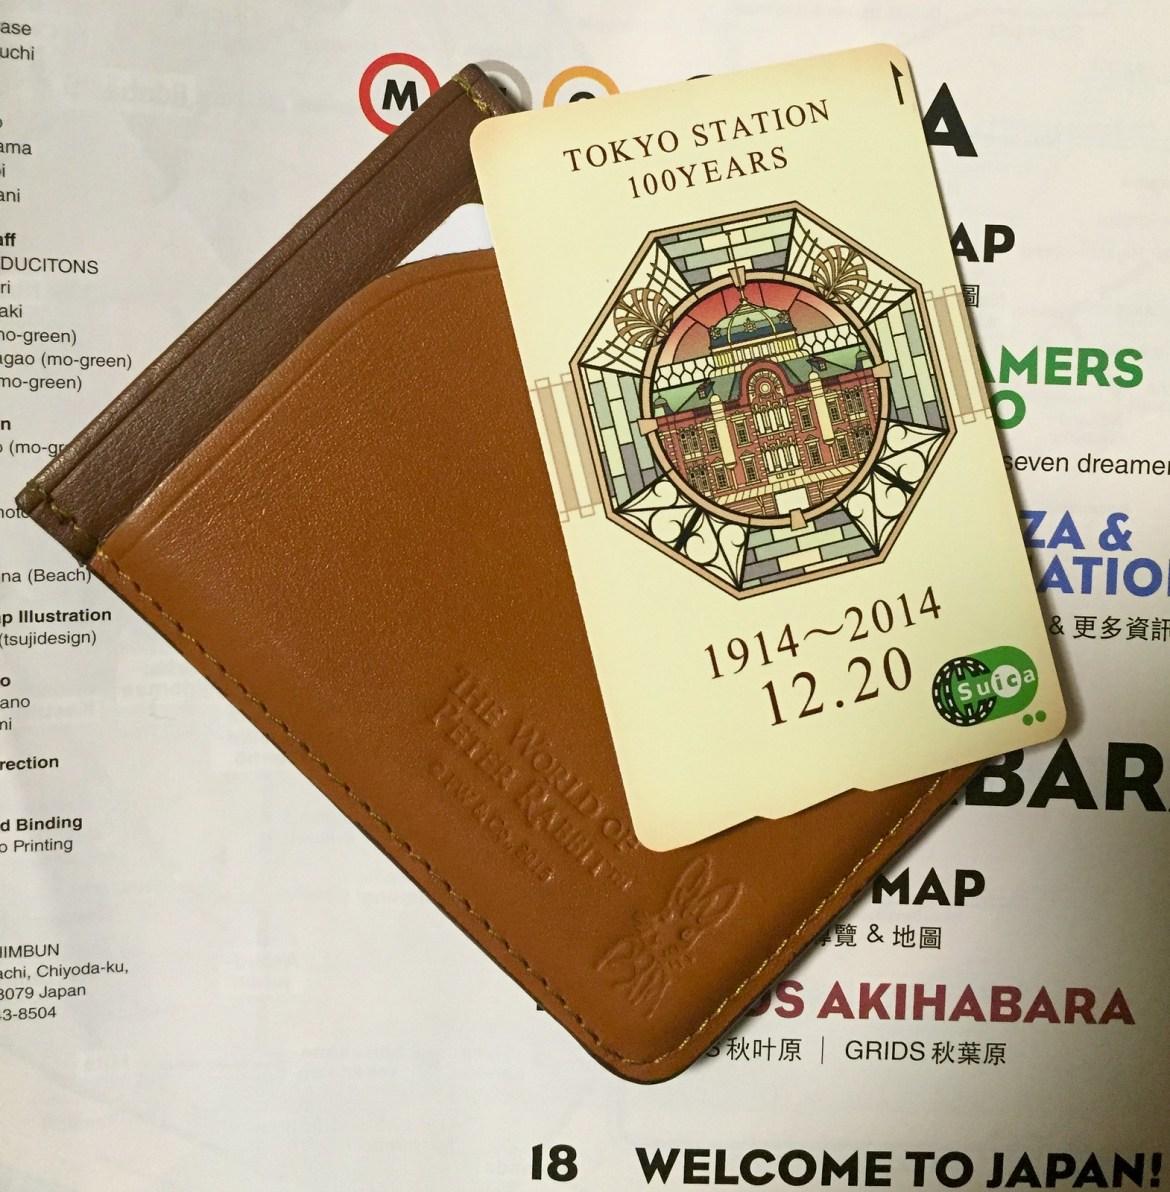 Tokyo Station 100 Year Anniversary Card